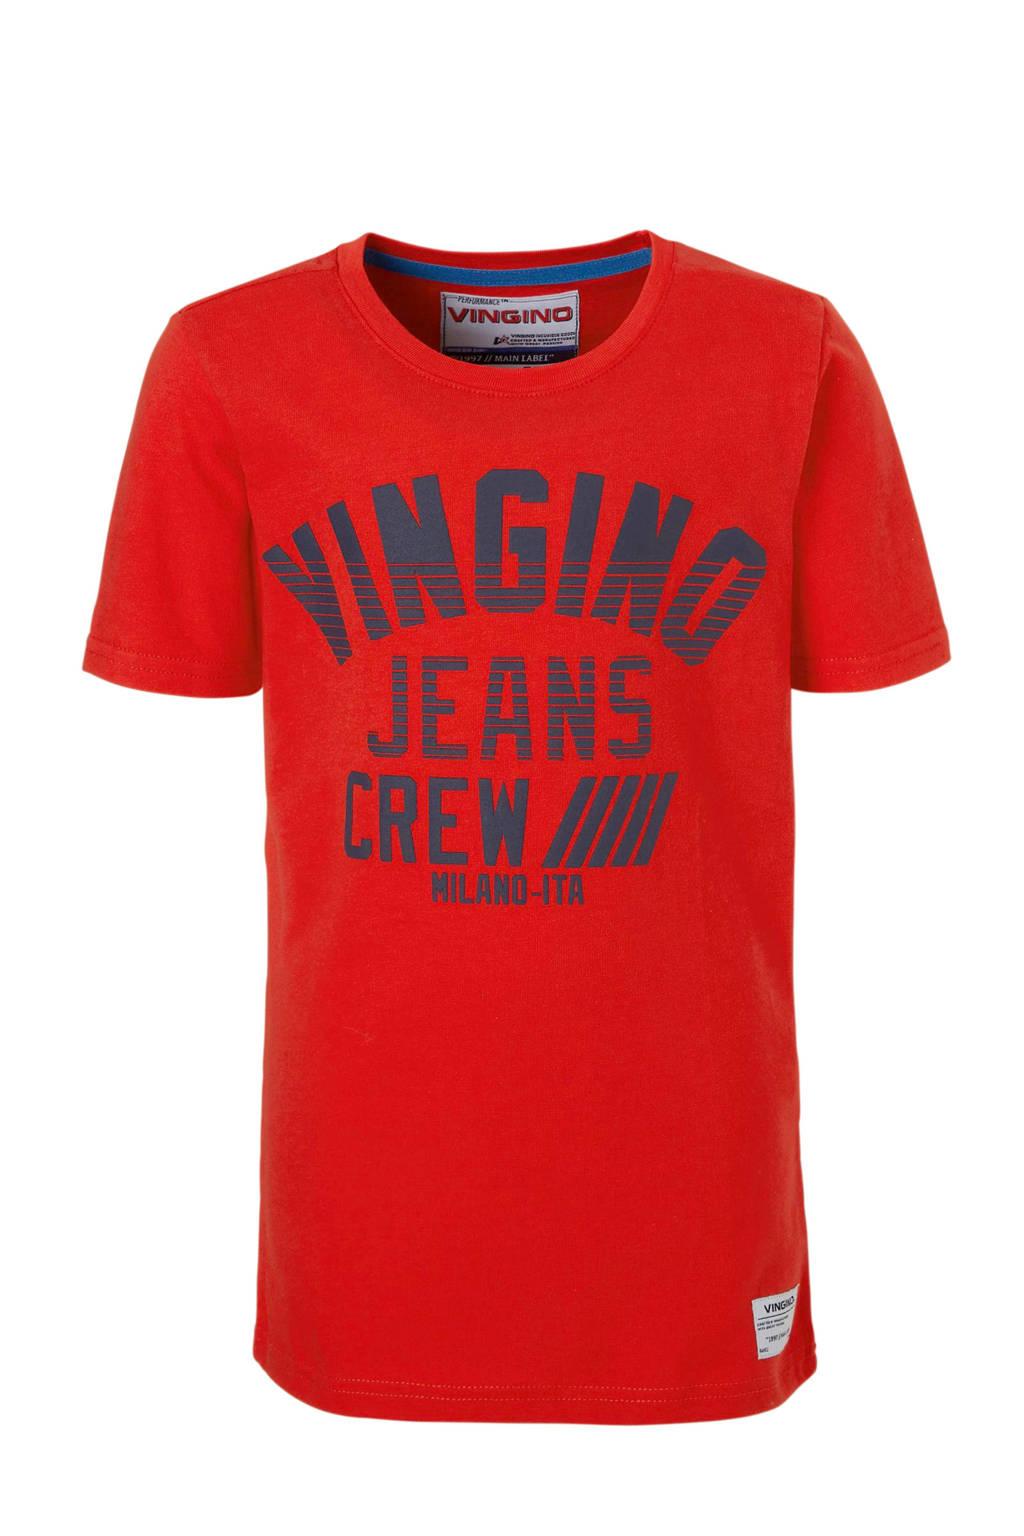 Vingino T-shirt Hadel met logo rood, Rood/zwart